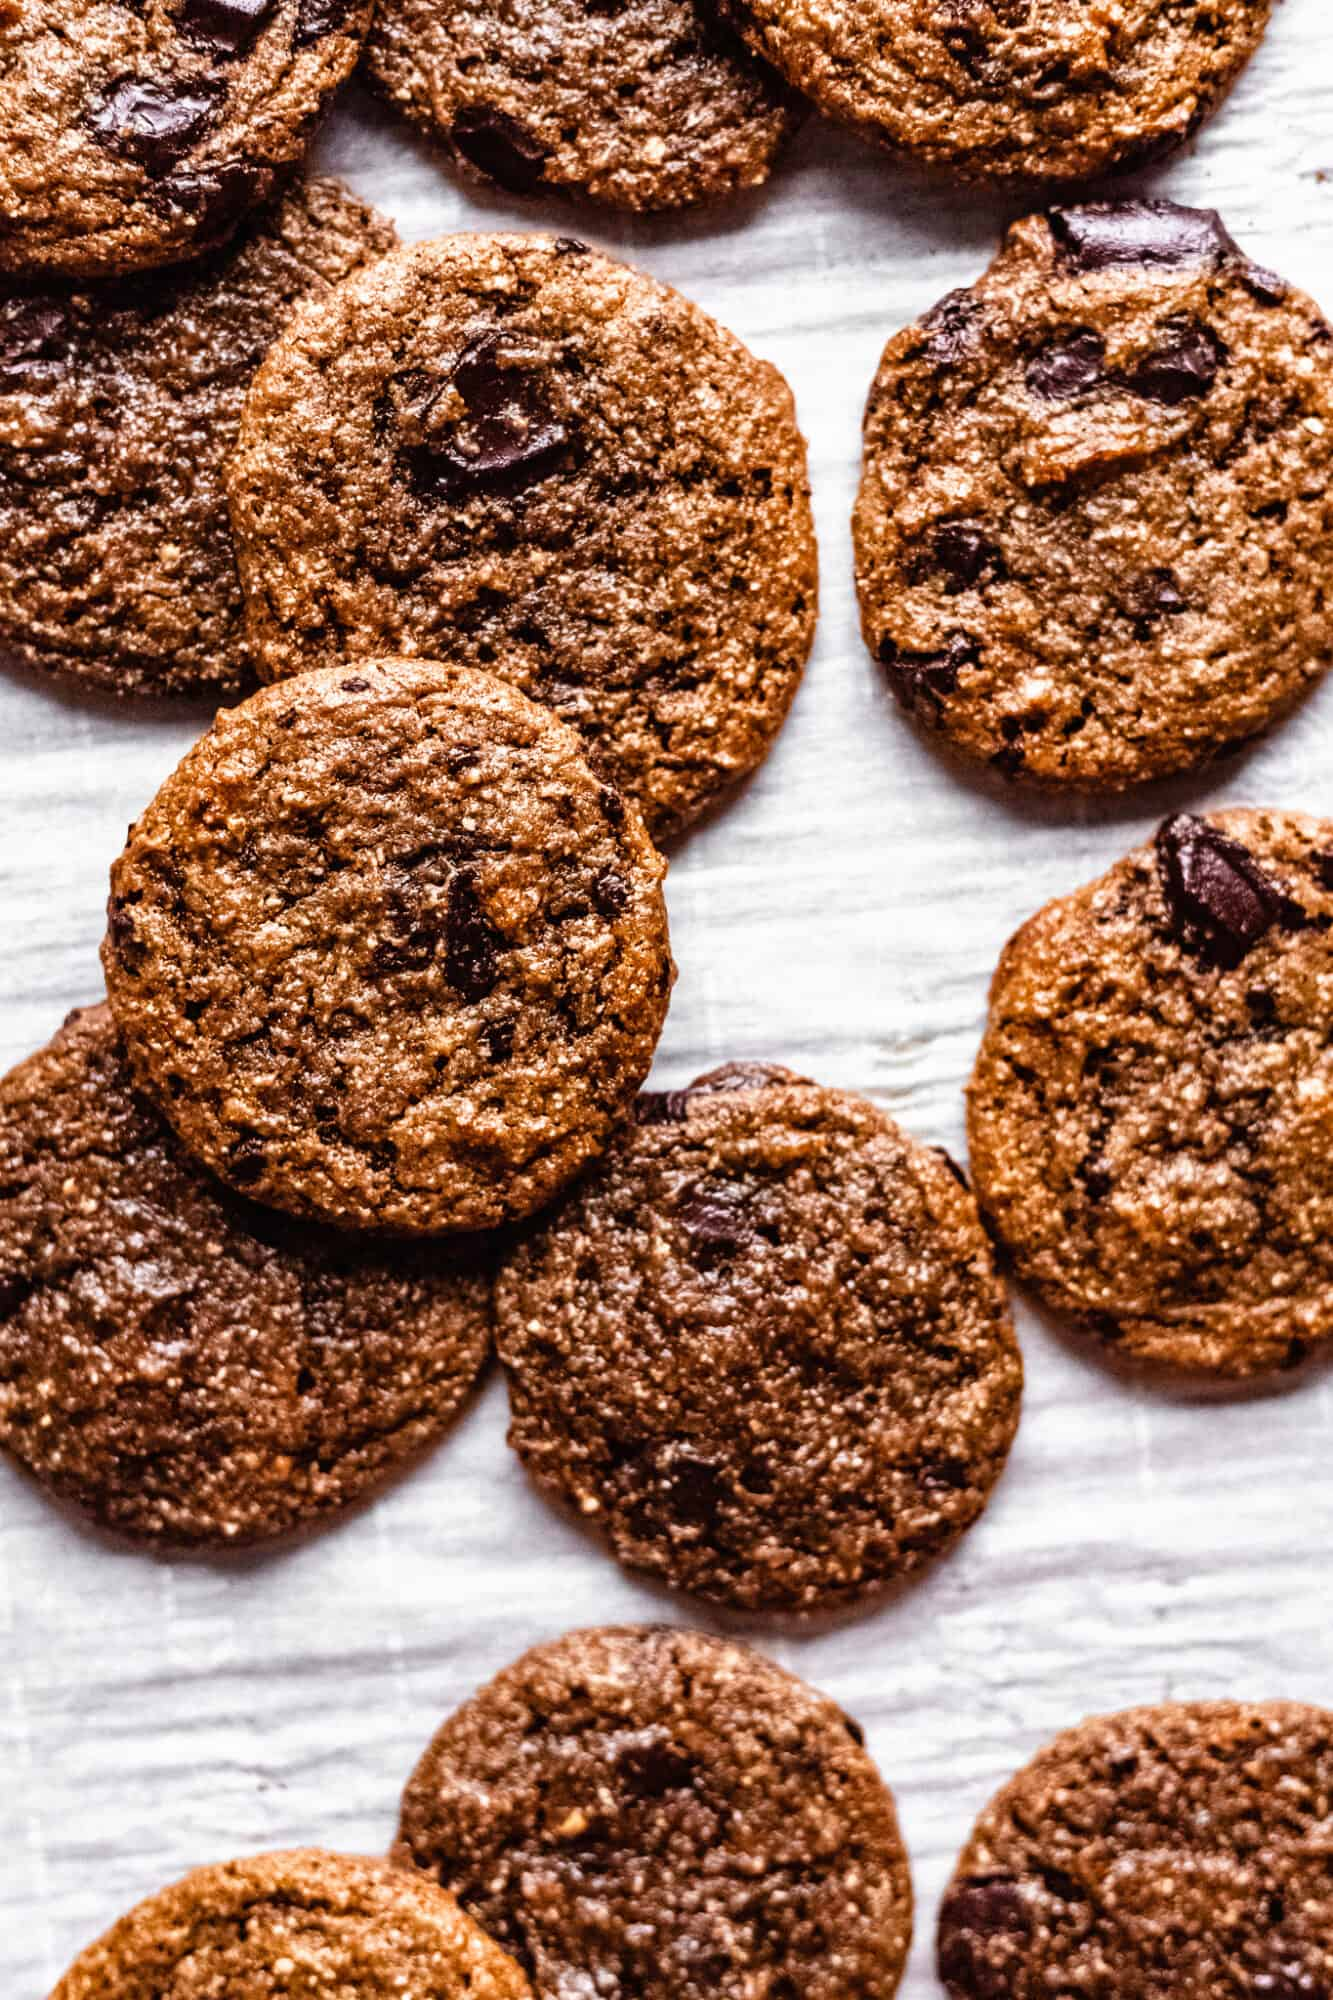 flourless chocolate chip cookies on a baking sheet